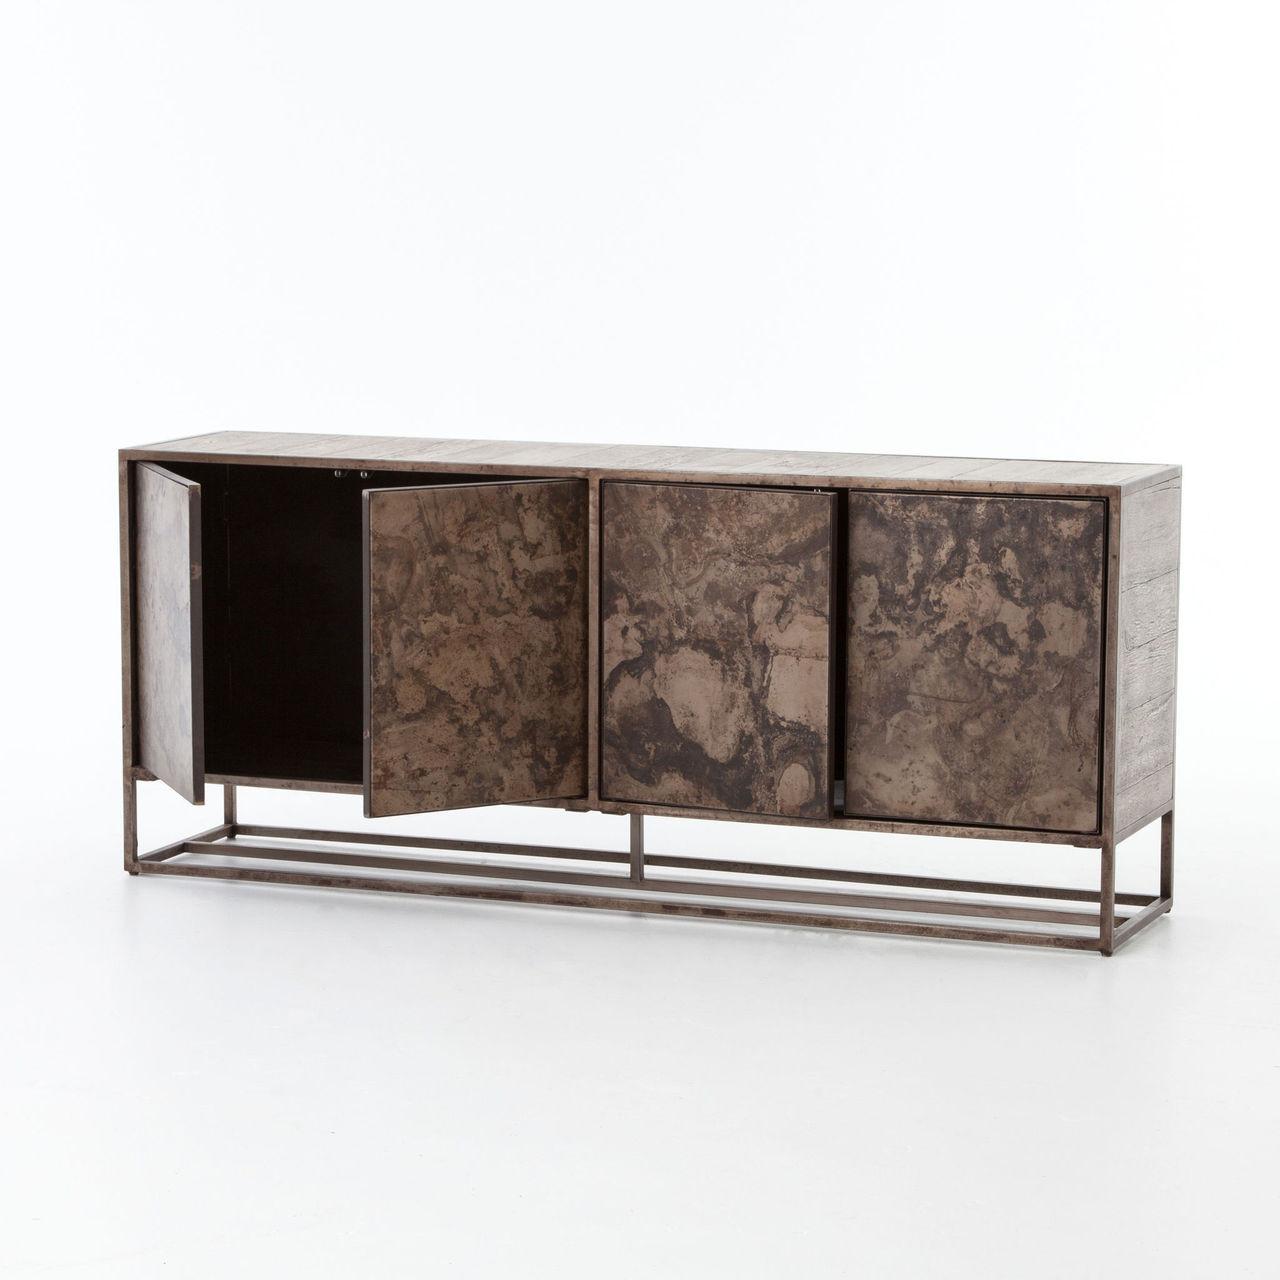 french industrial iron oak wood 4 door sideboard zin home. Black Bedroom Furniture Sets. Home Design Ideas